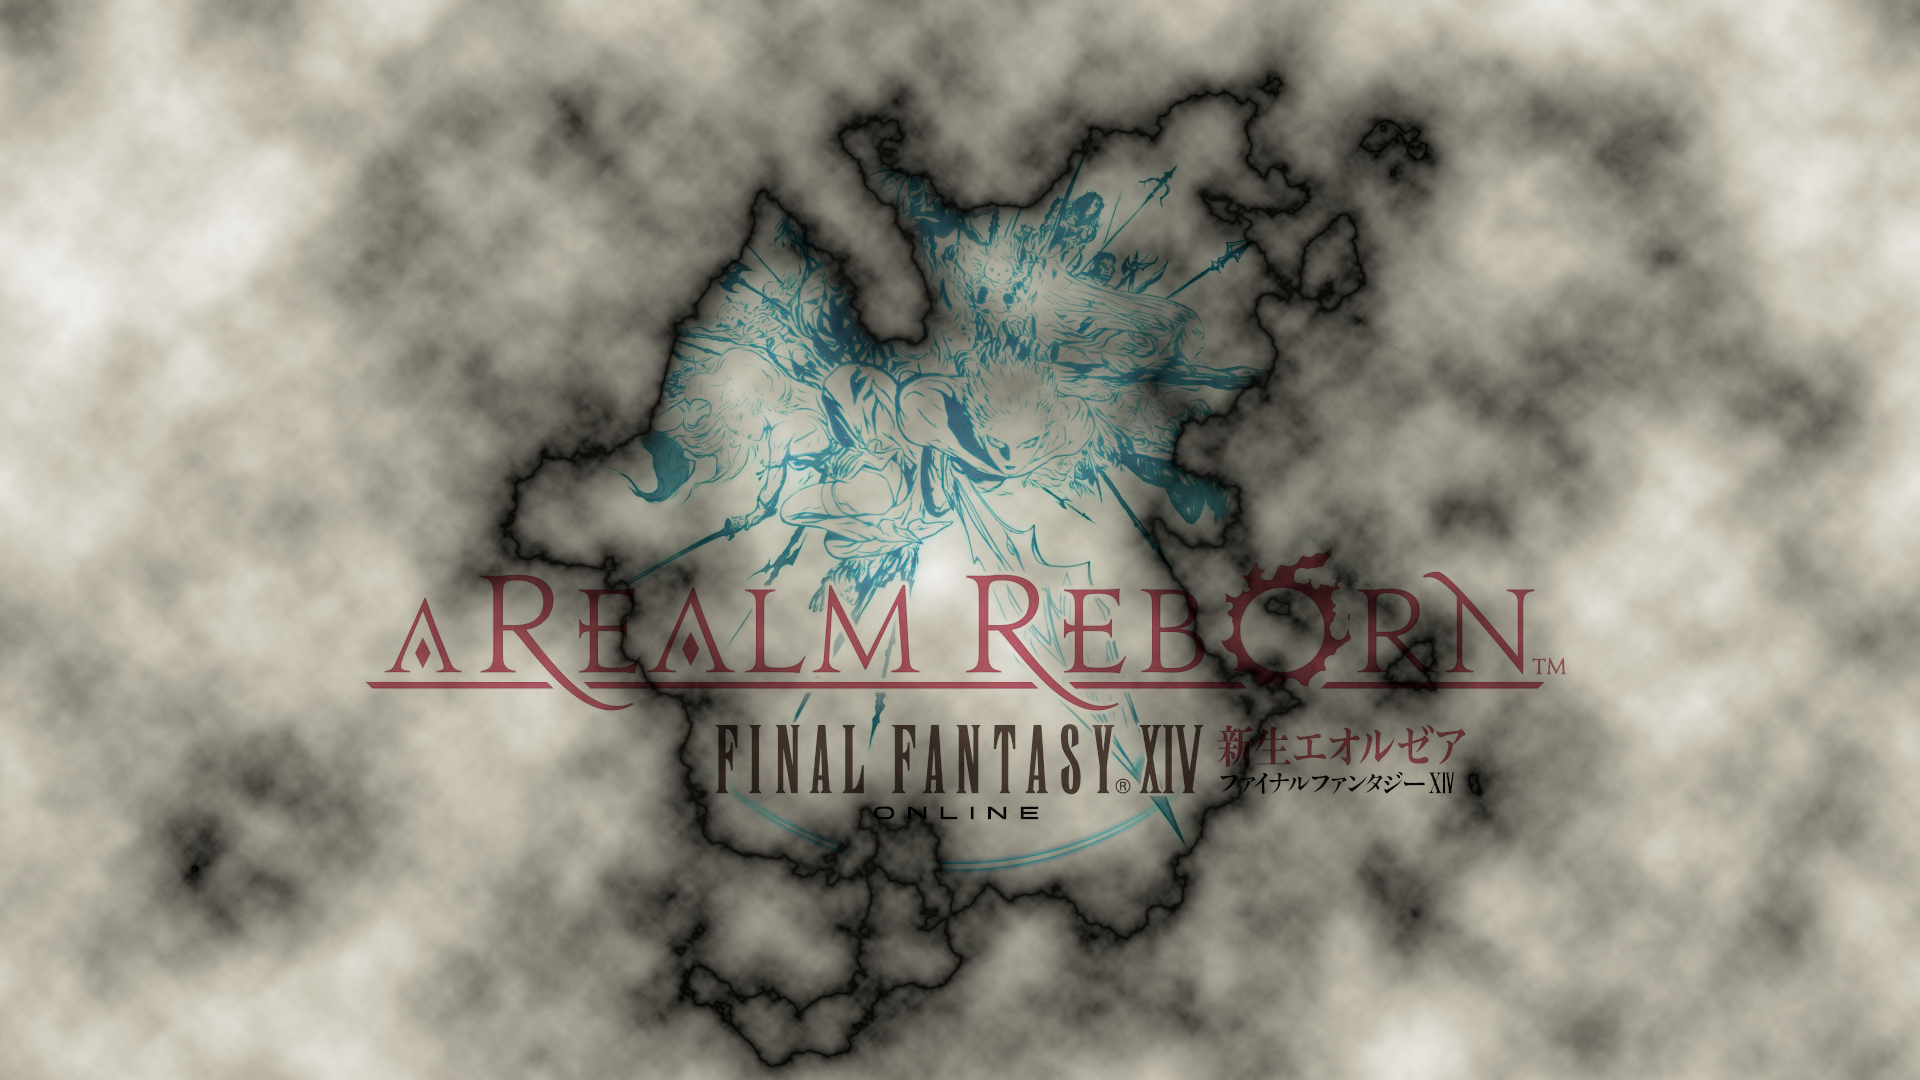 Final Fantasy Xiv A Realm Reborn Fantasy Art Wallpapers: Final Fantasy XIV A Realm Reborn Wallpaper 2 By AlboQuest